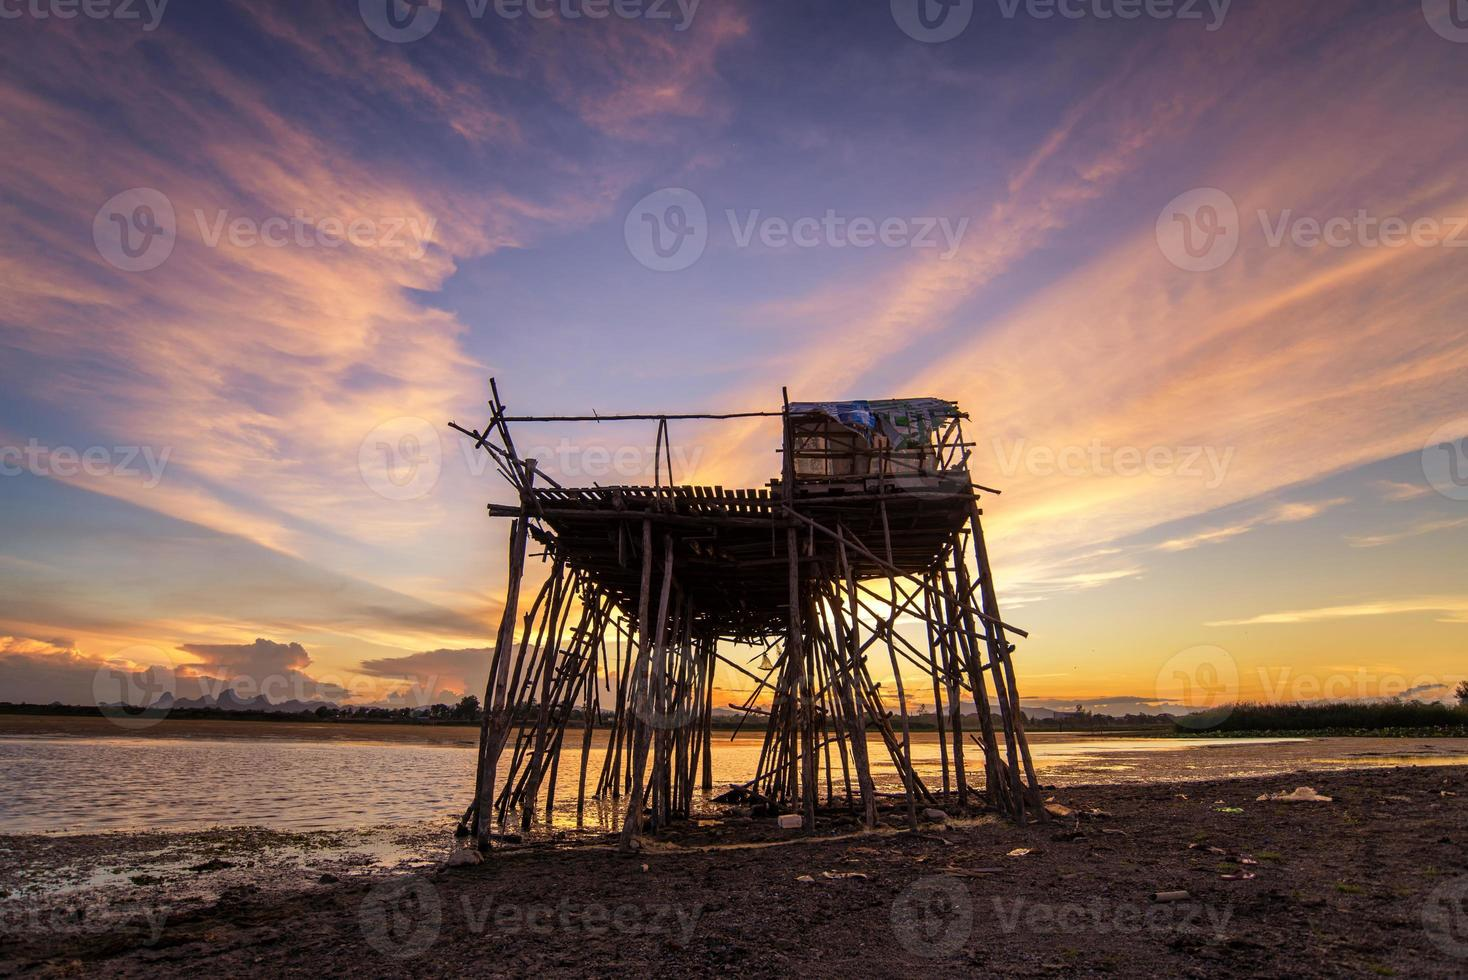 Abandon wooden fisherman hut in beautiful sunset scene photo